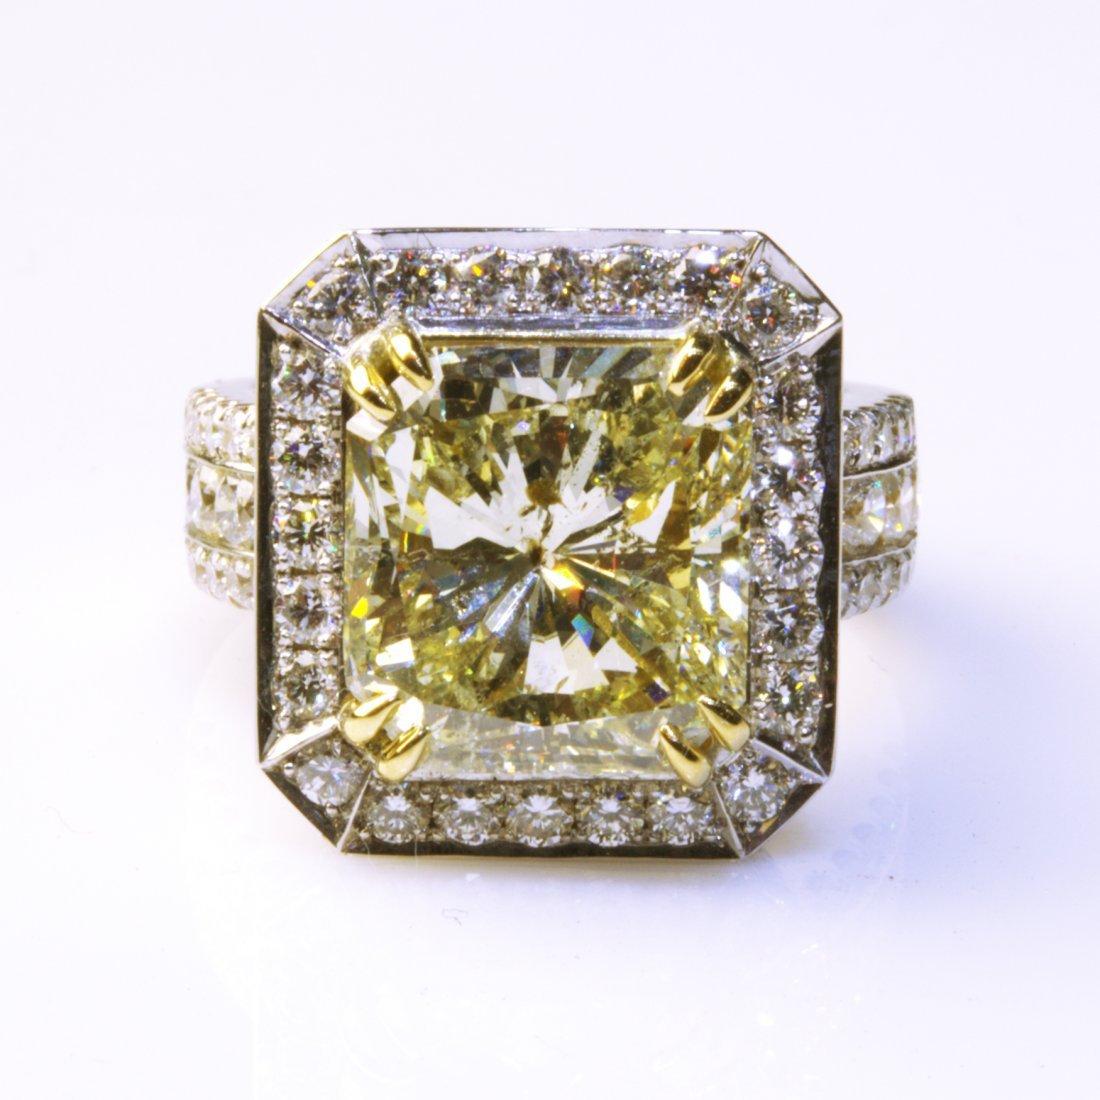 18K White Gold 8.51ctw Fancy Yellow Diamond Ring